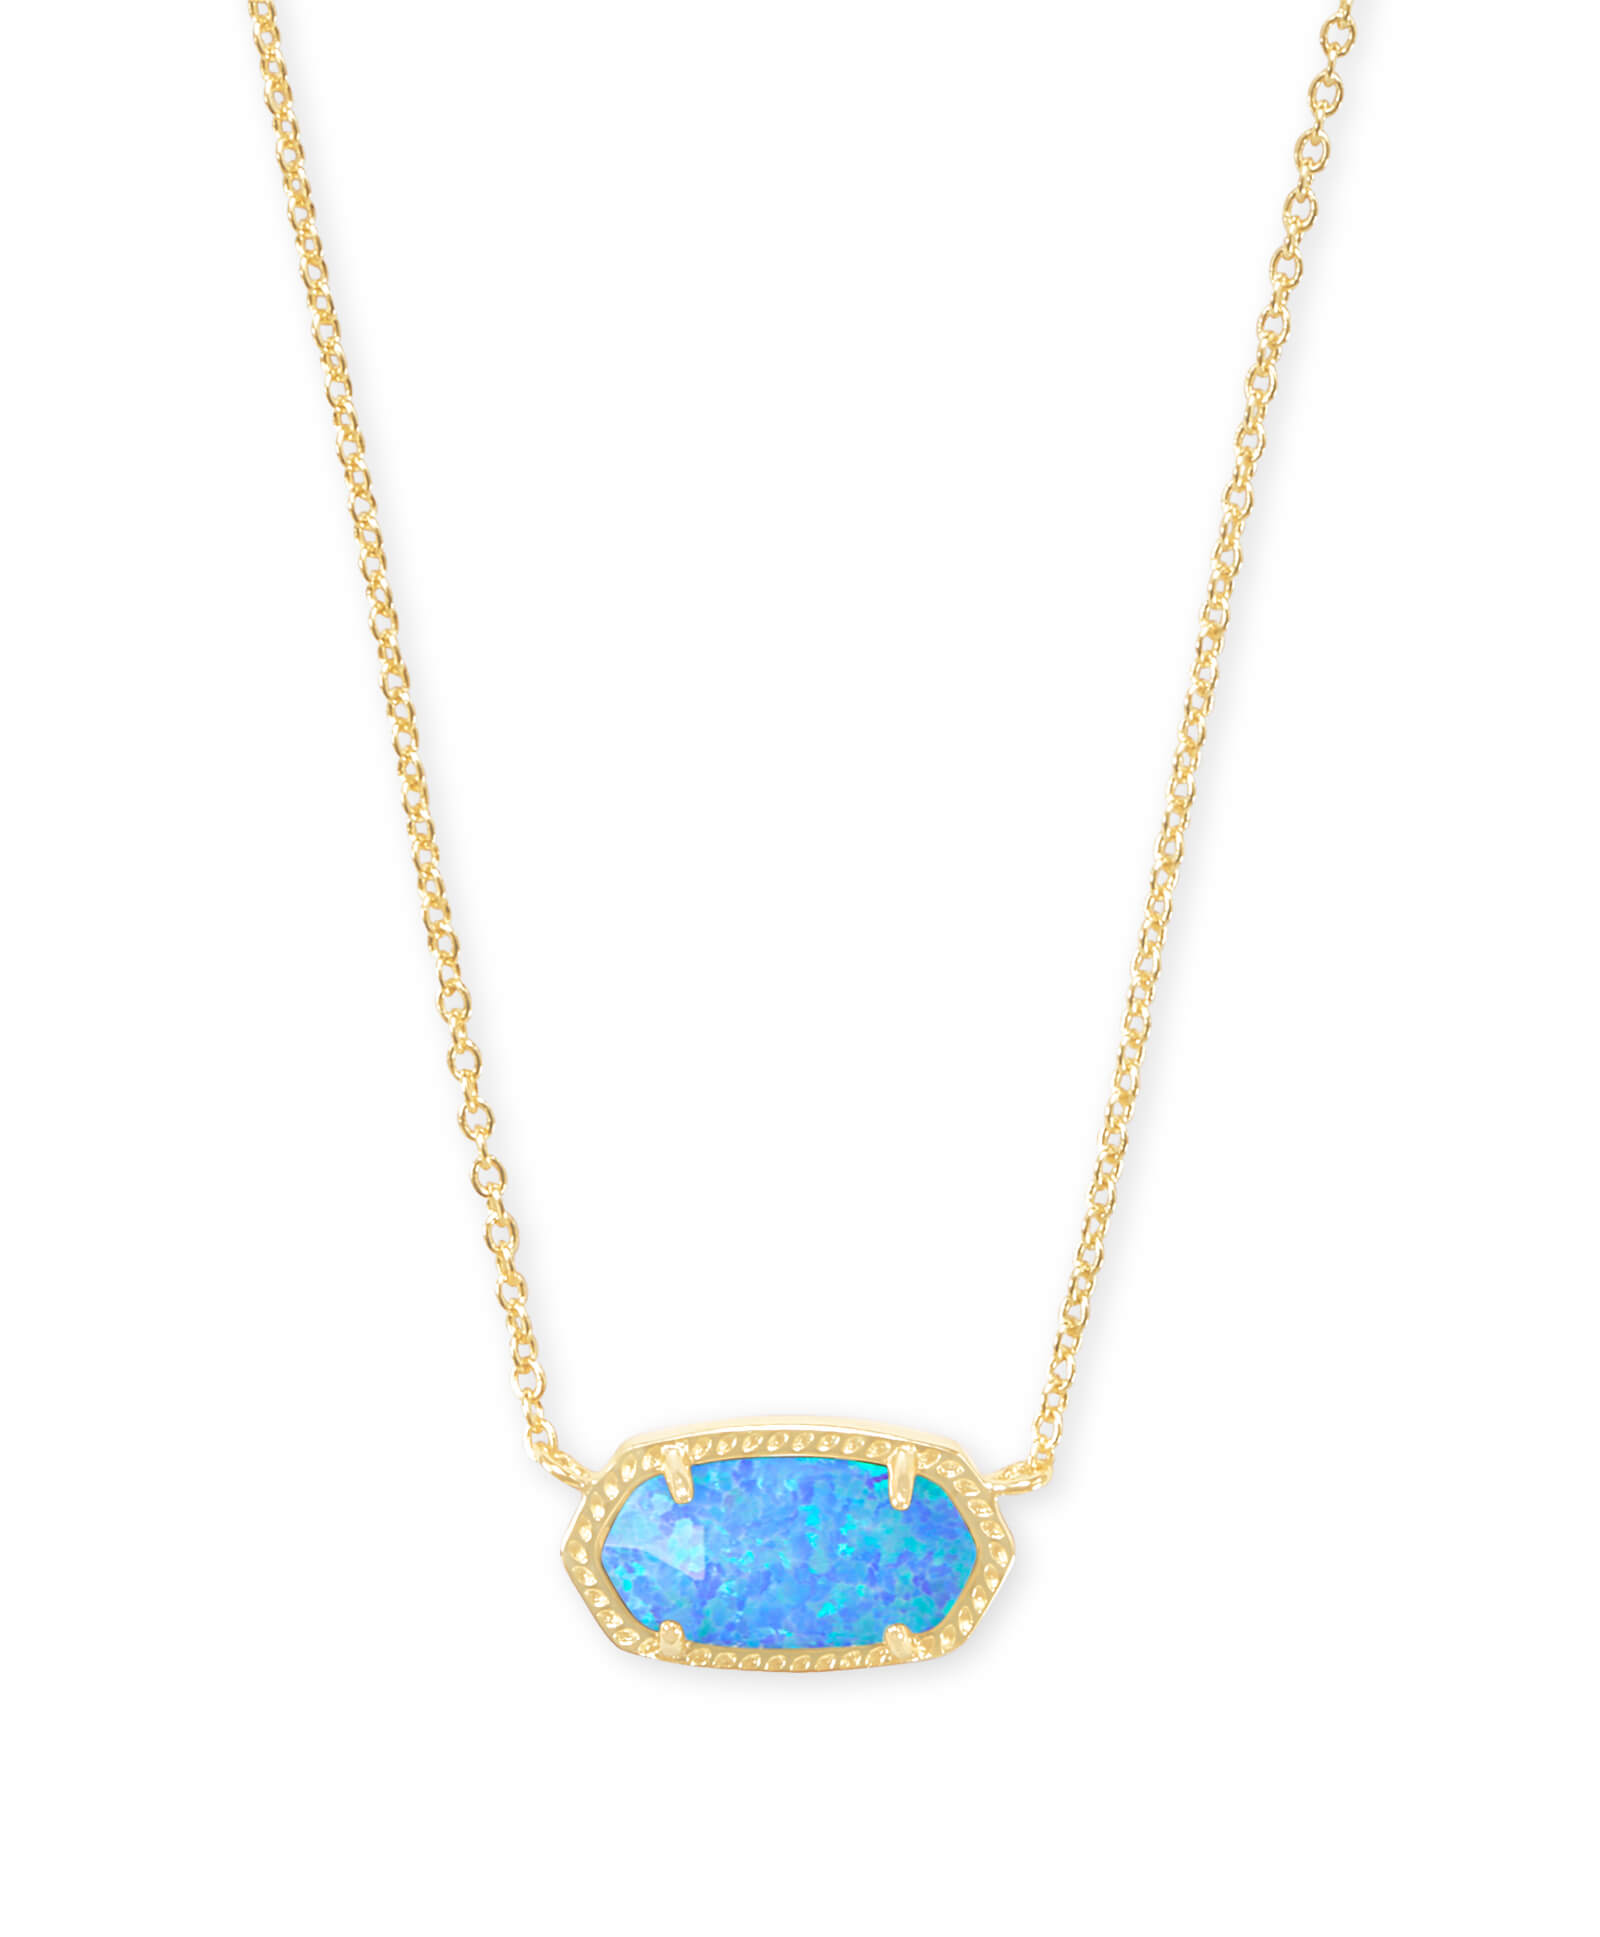 kendra scott elisa necklace gold azure opal 00 lg